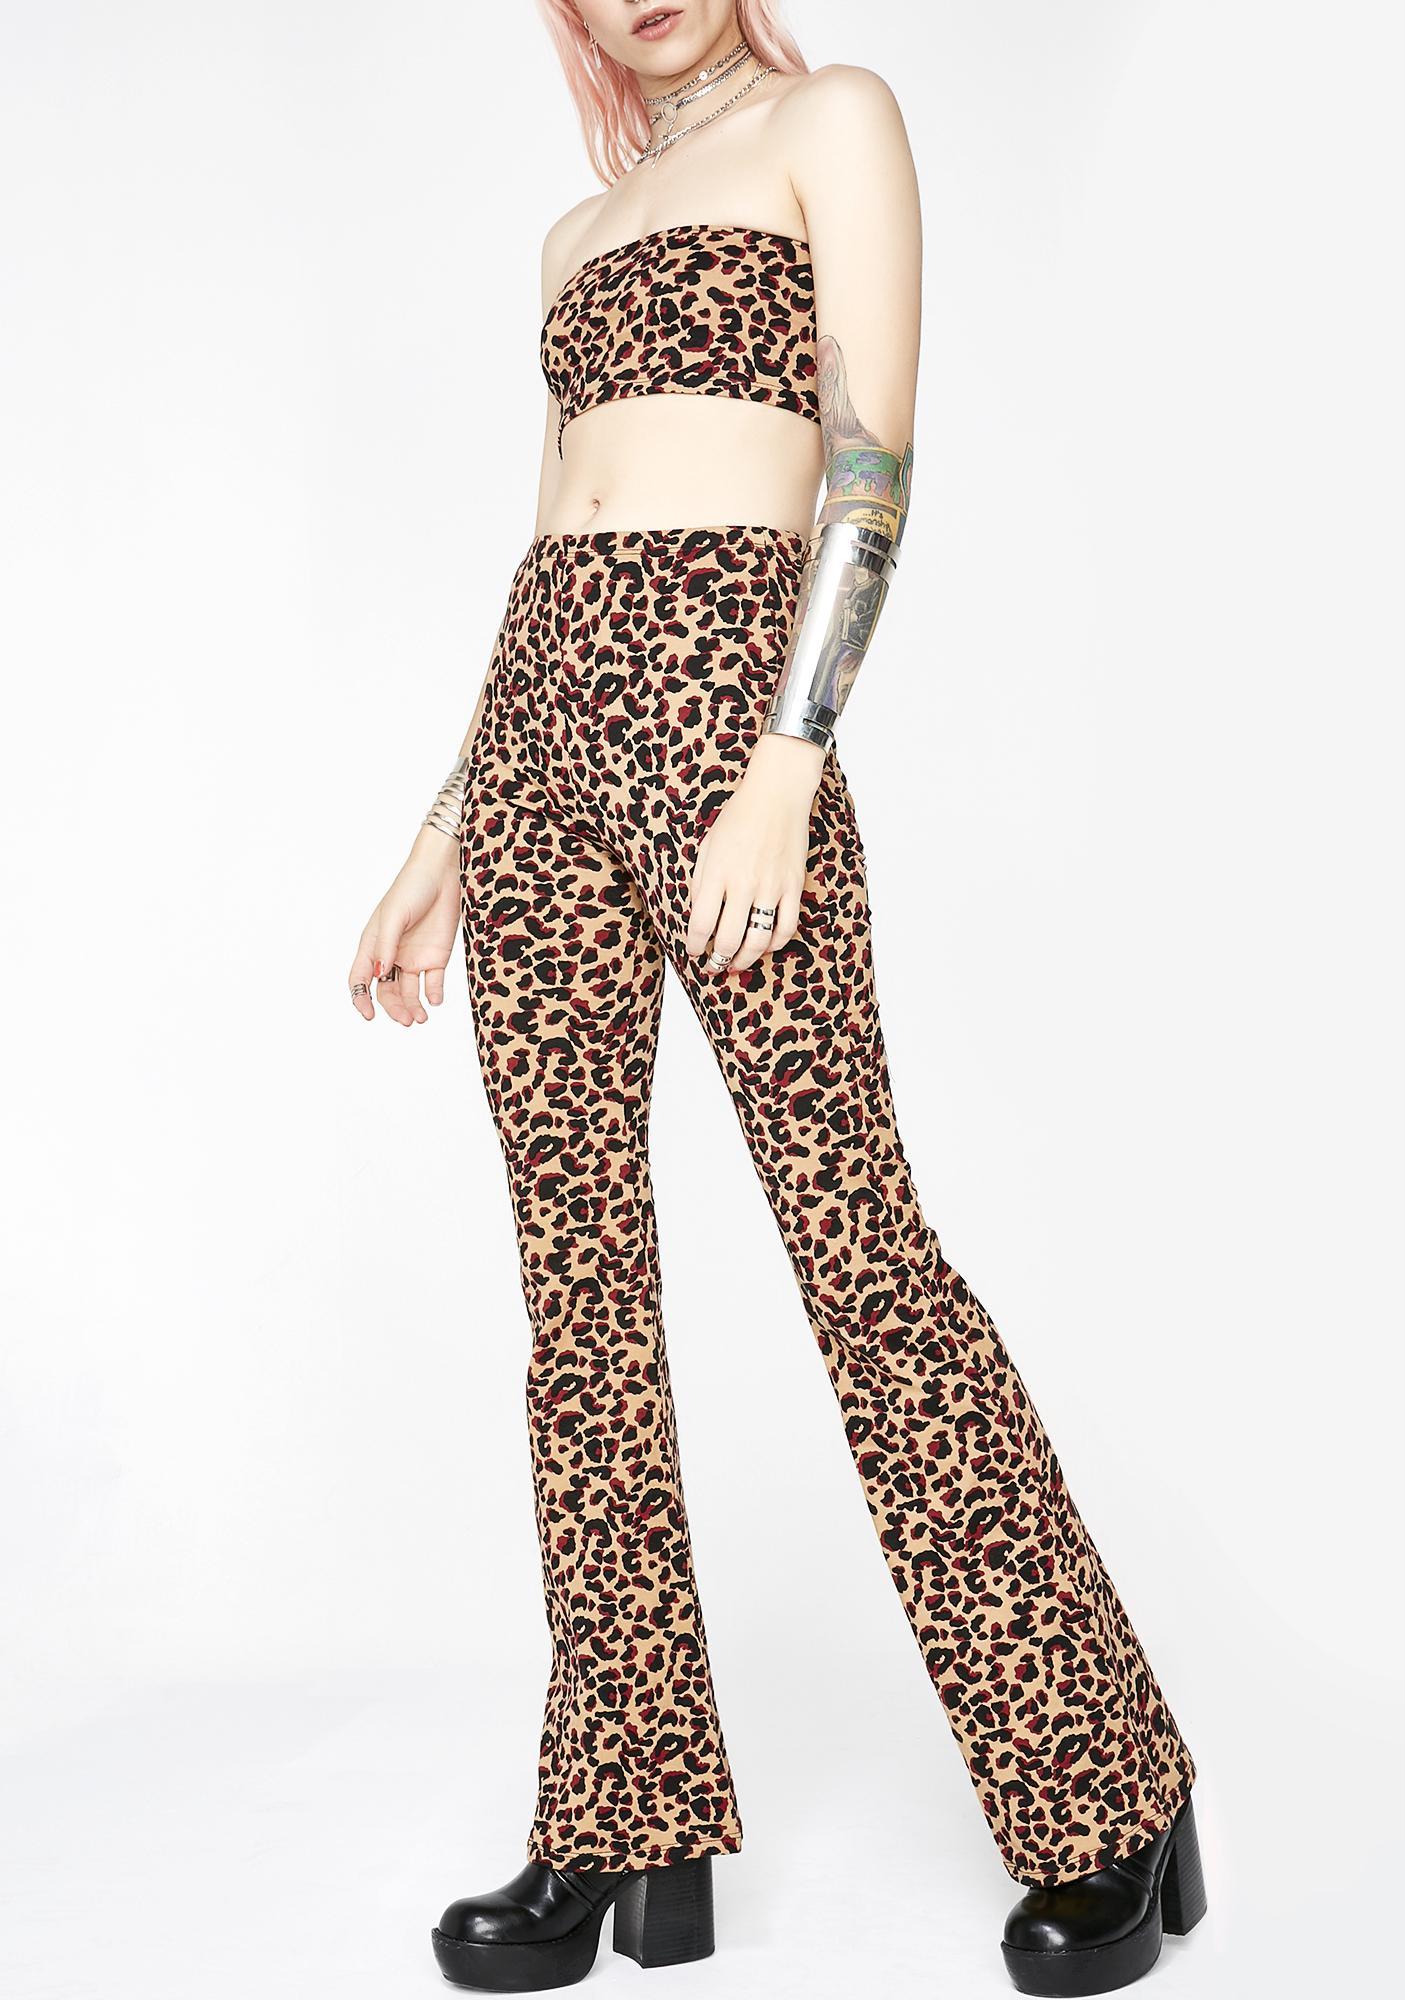 Motel Jungle Leopard Jeevan Twinset